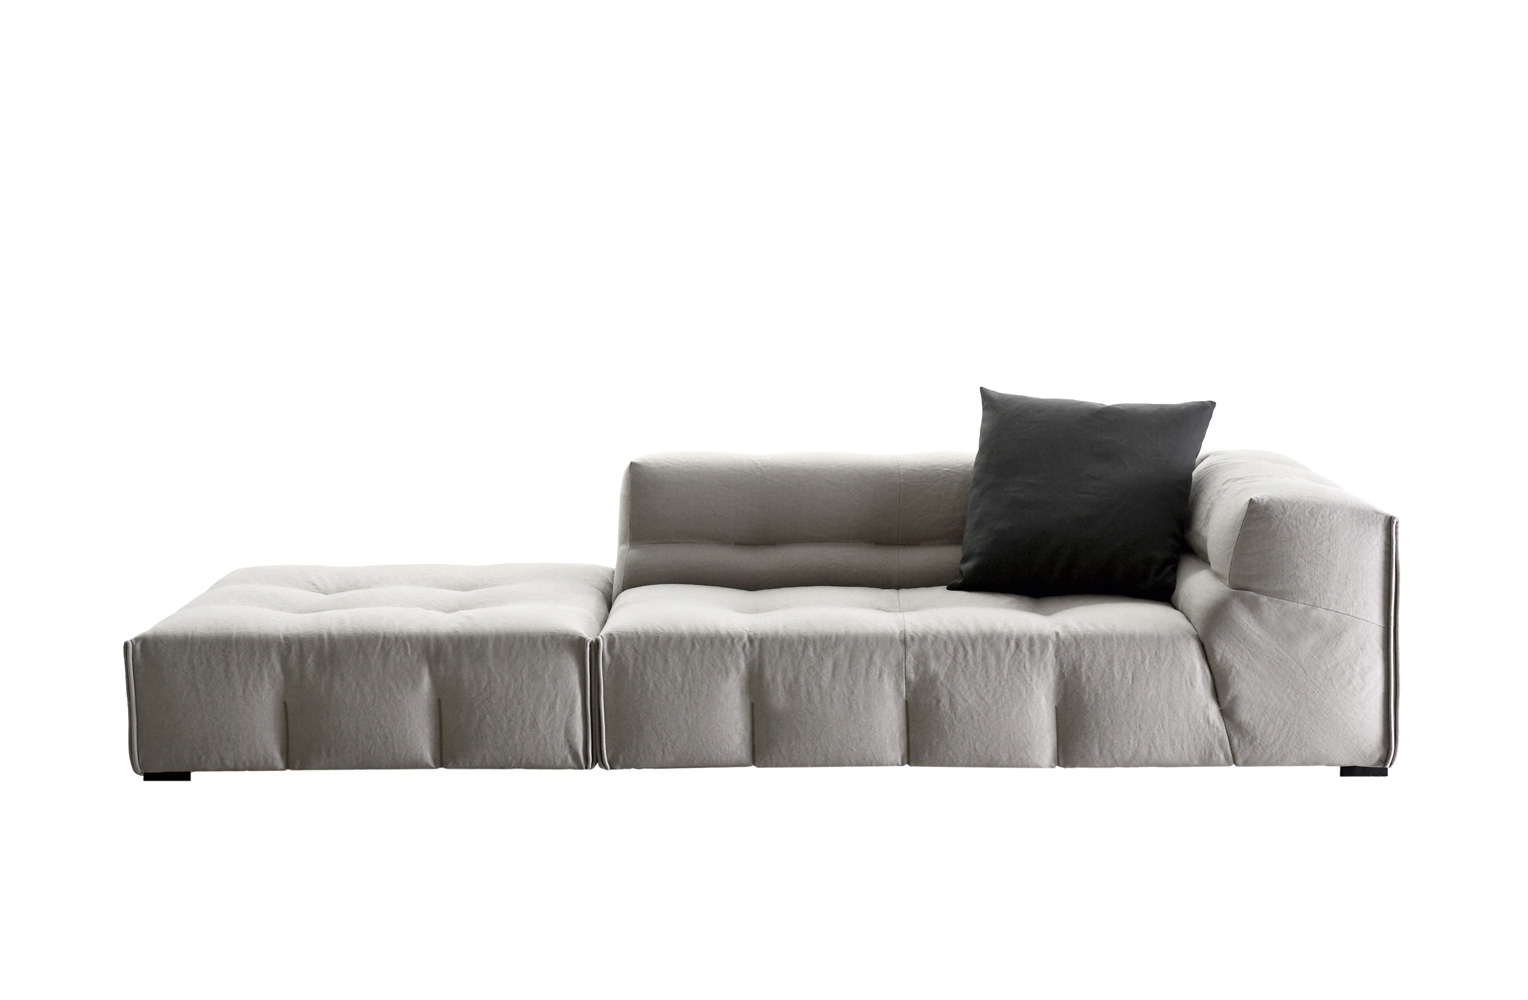 Tufty Too Sofa By B Amp B Italia Designer Furniture Fitted